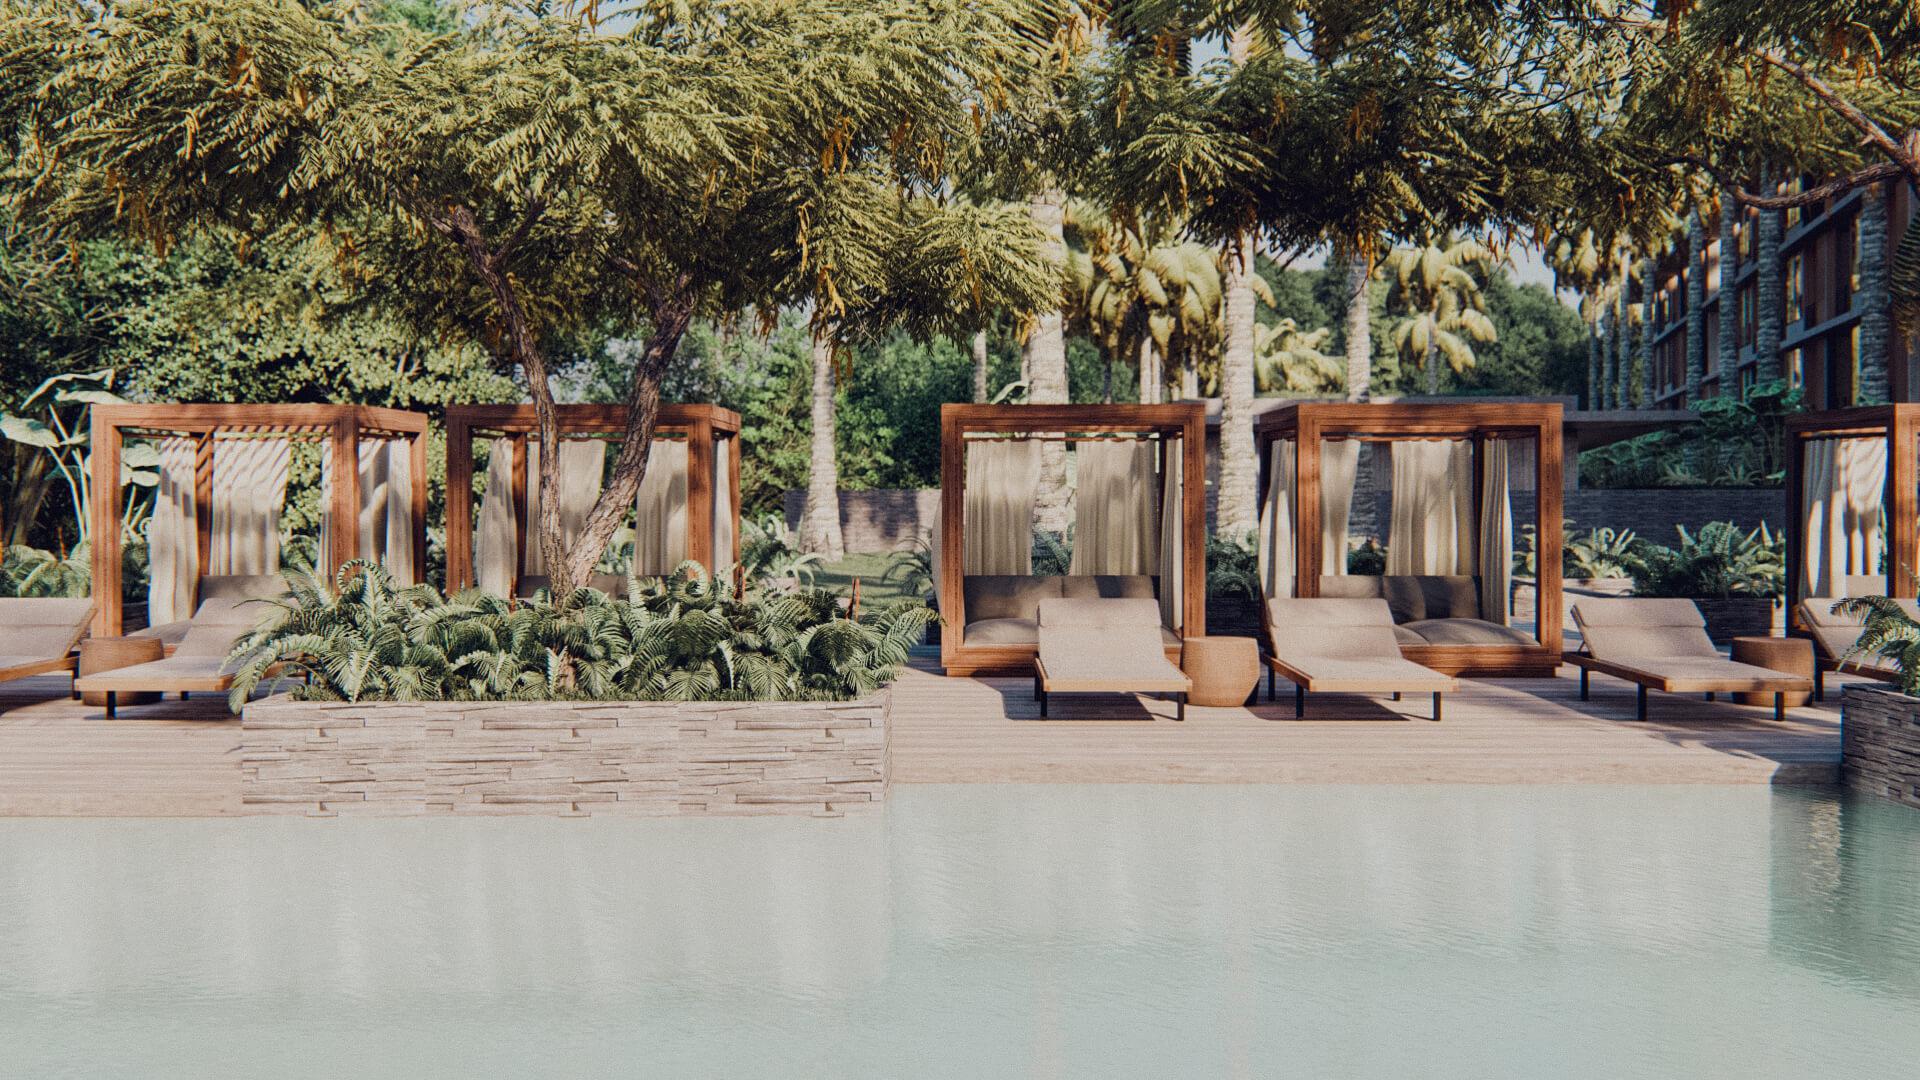 Resort Hotel Swimming Pool Deck Lombok Bali Architect 01